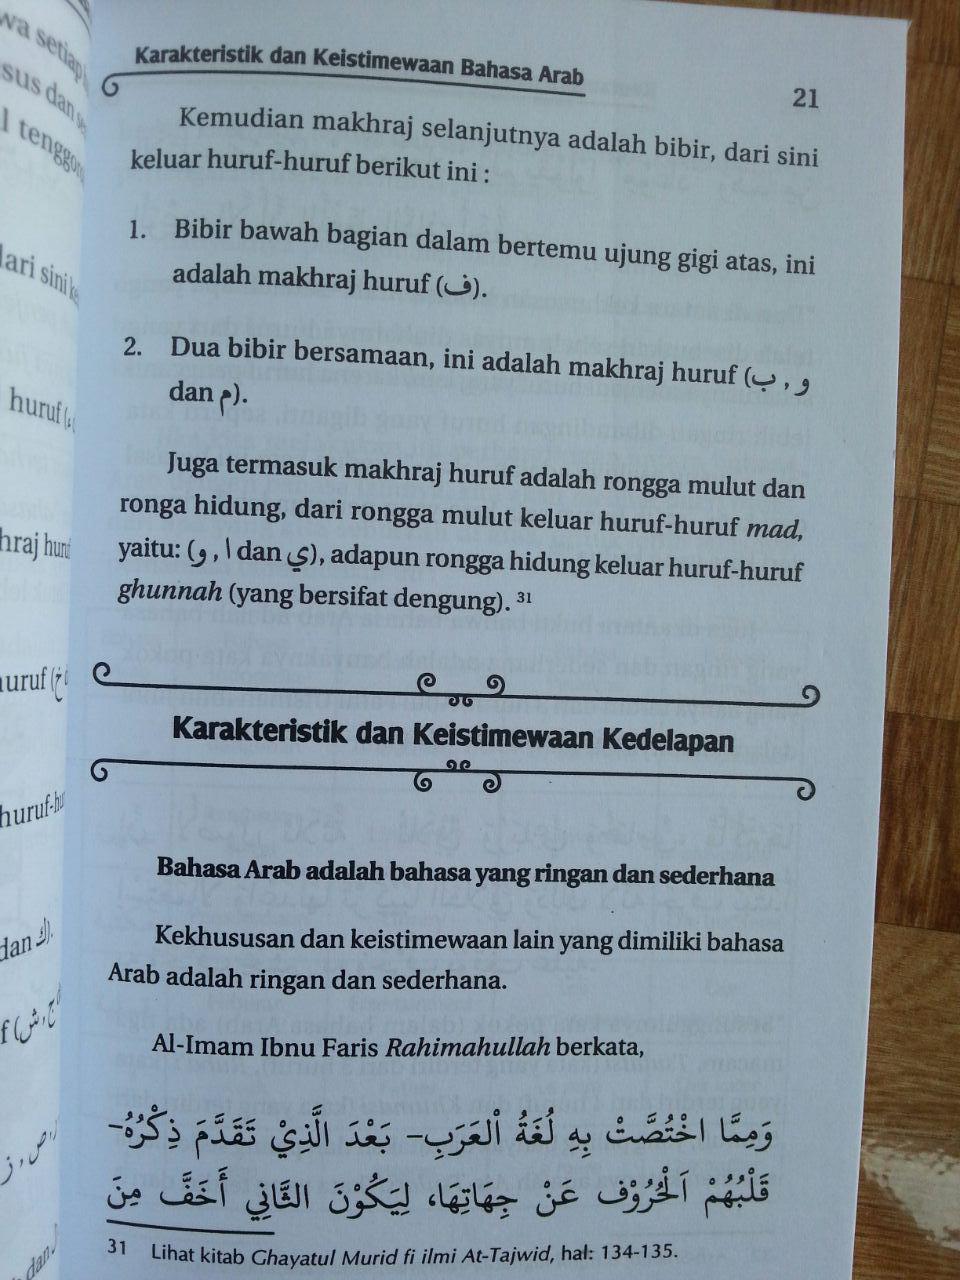 Buku Keutamaan dan Kewajiban Mempelajari Bahasa Arab isi 2